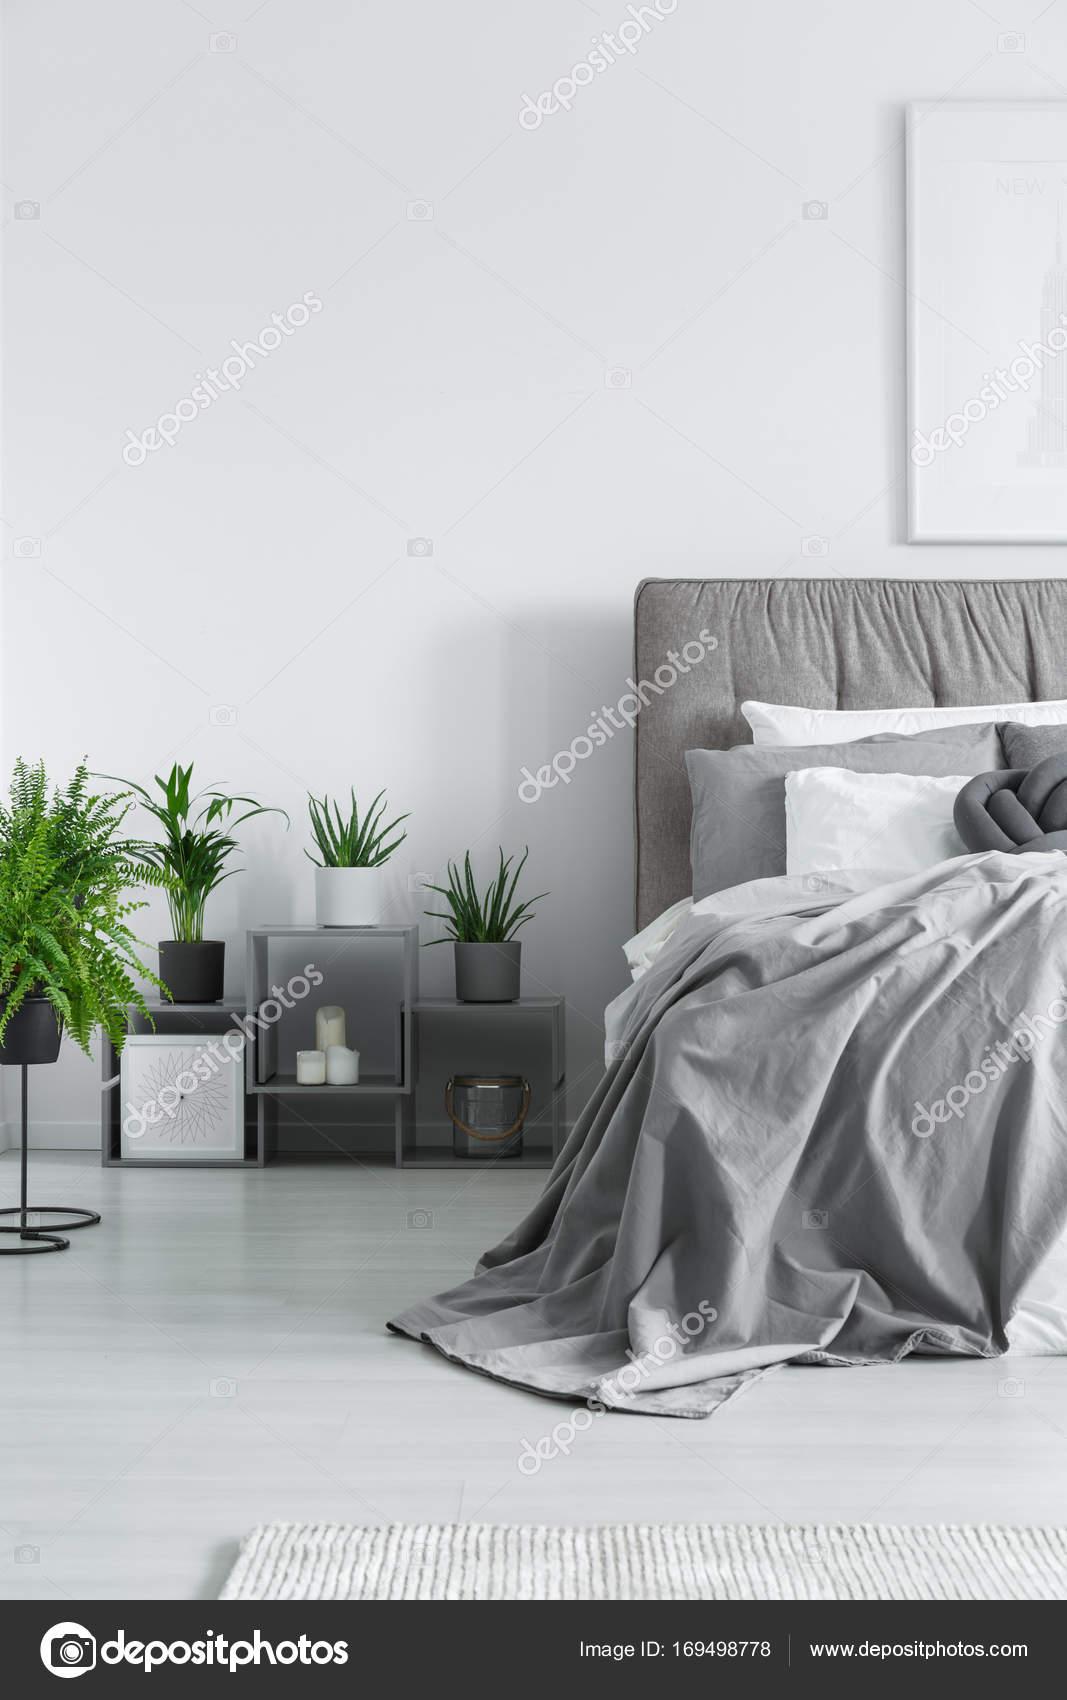 talrijke planten in slaapkamer stockfoto